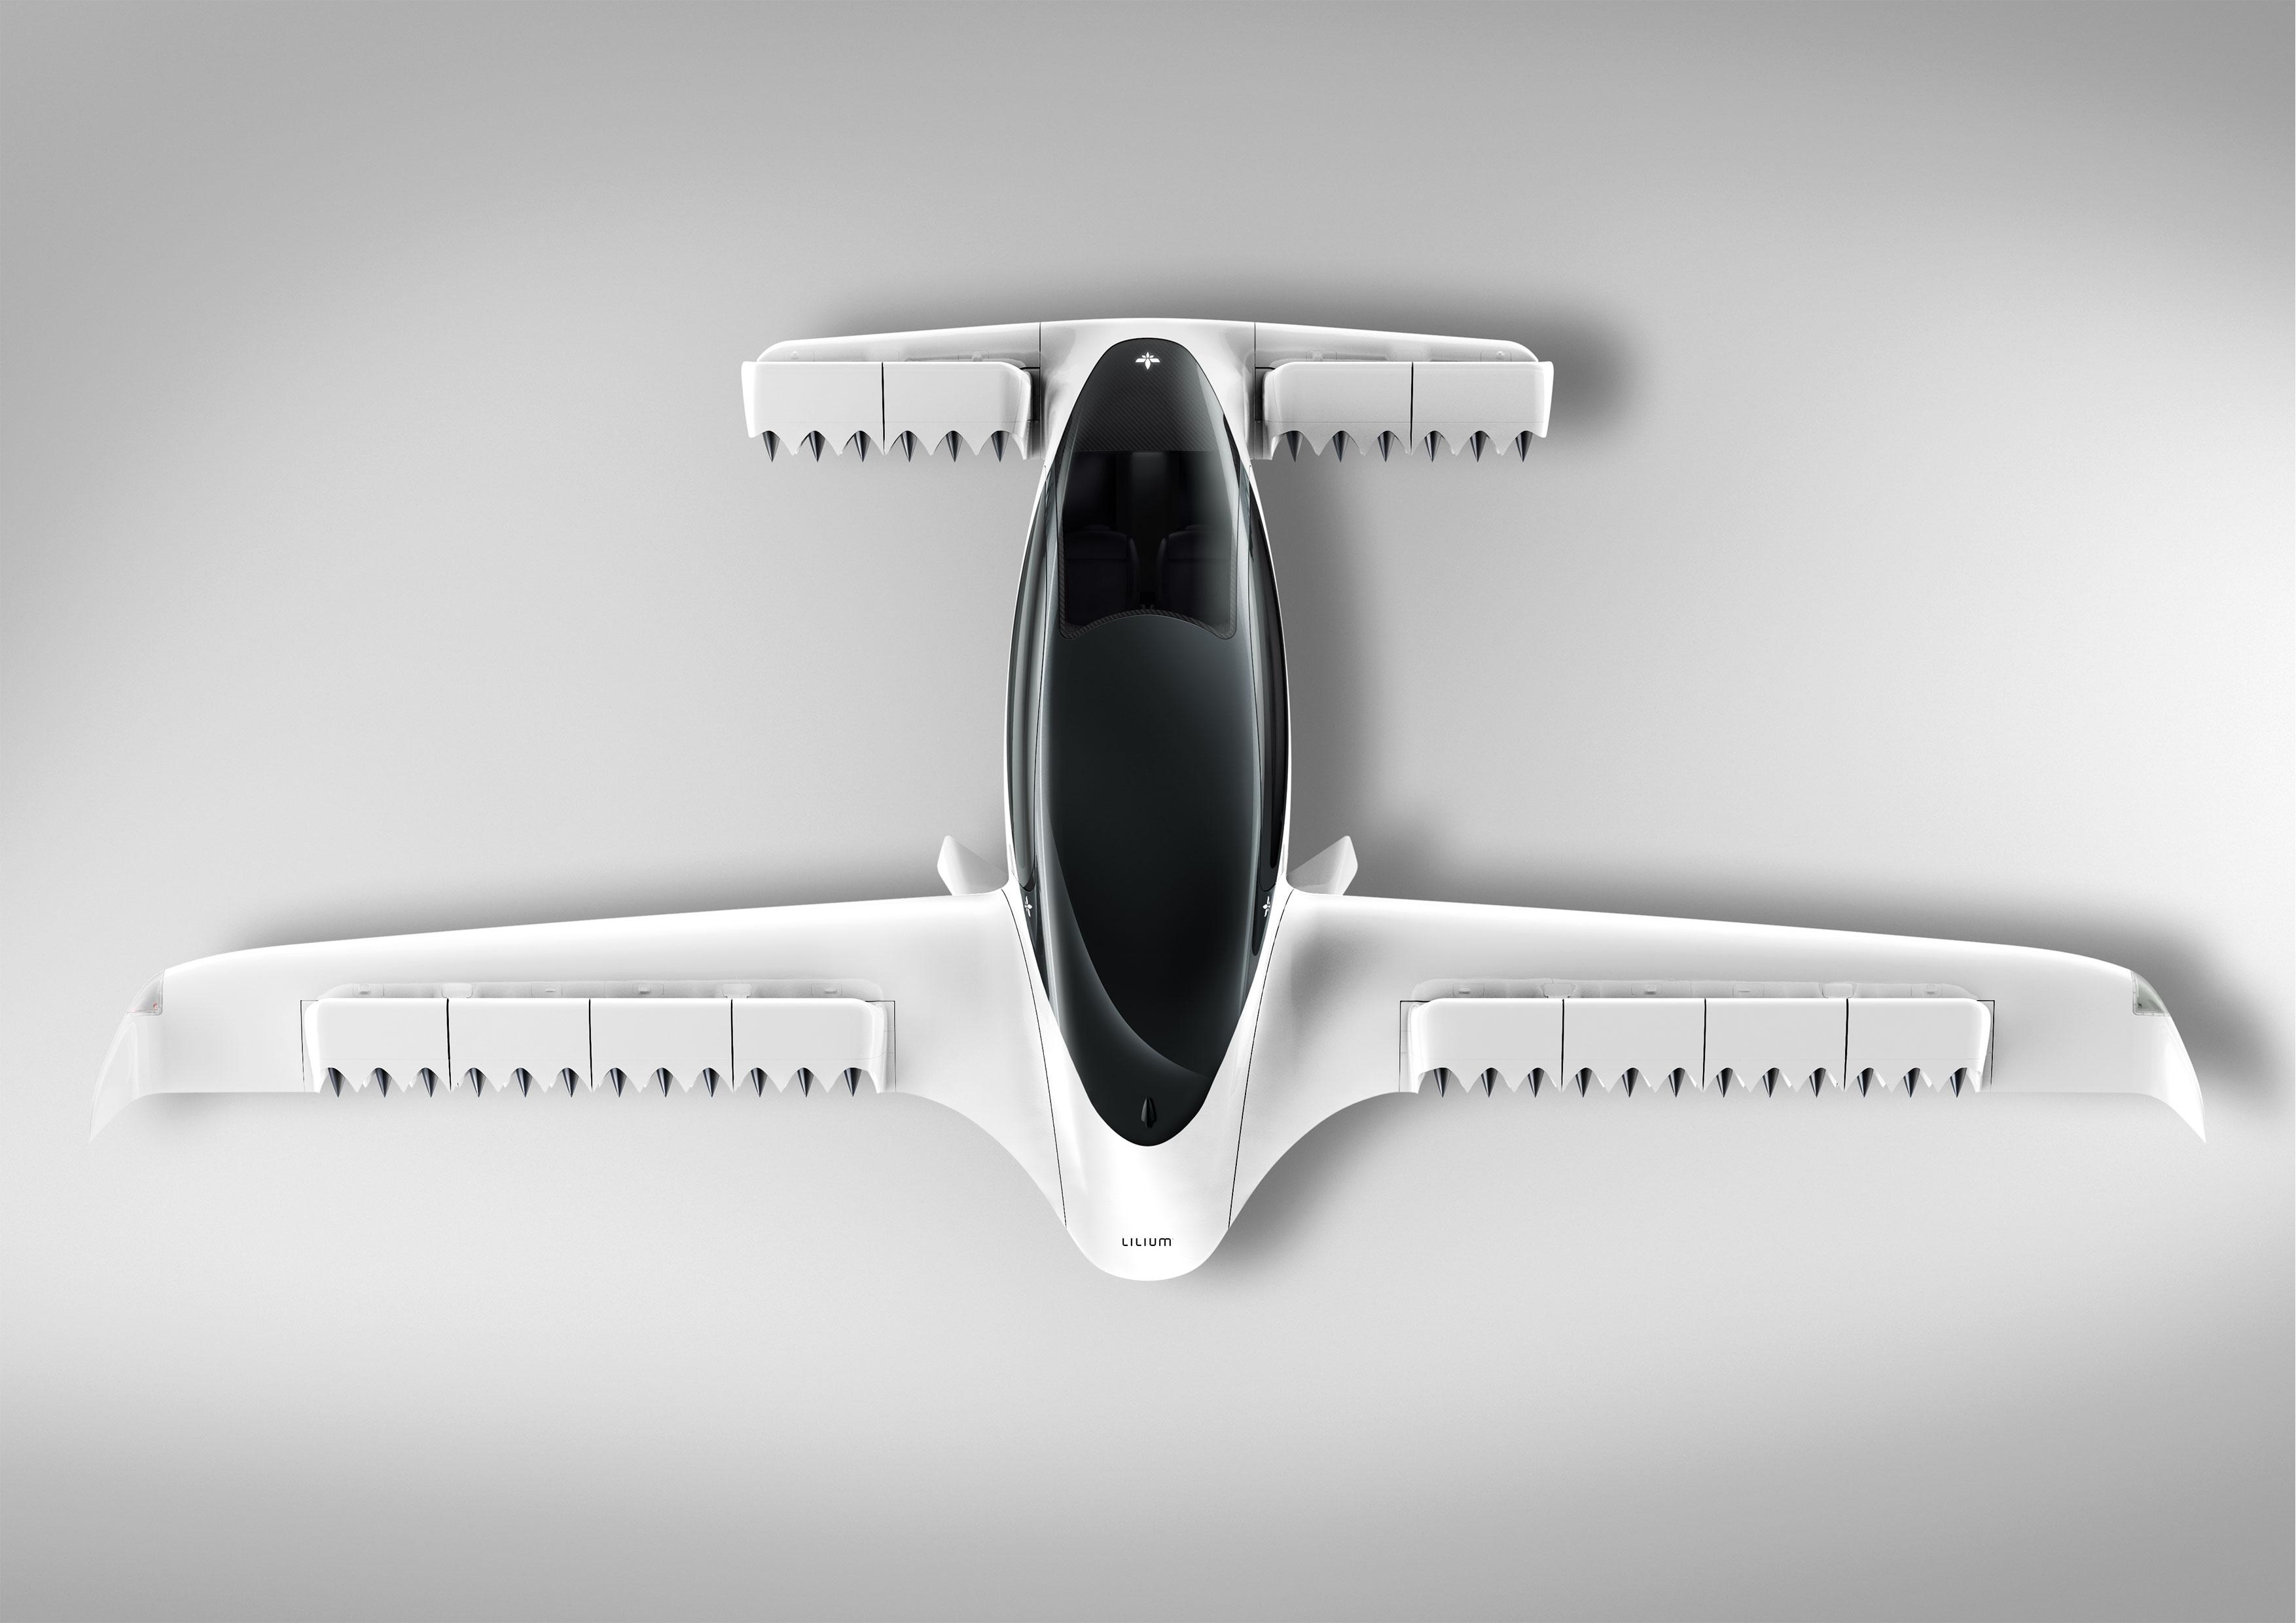 Lilium Jet overhead view